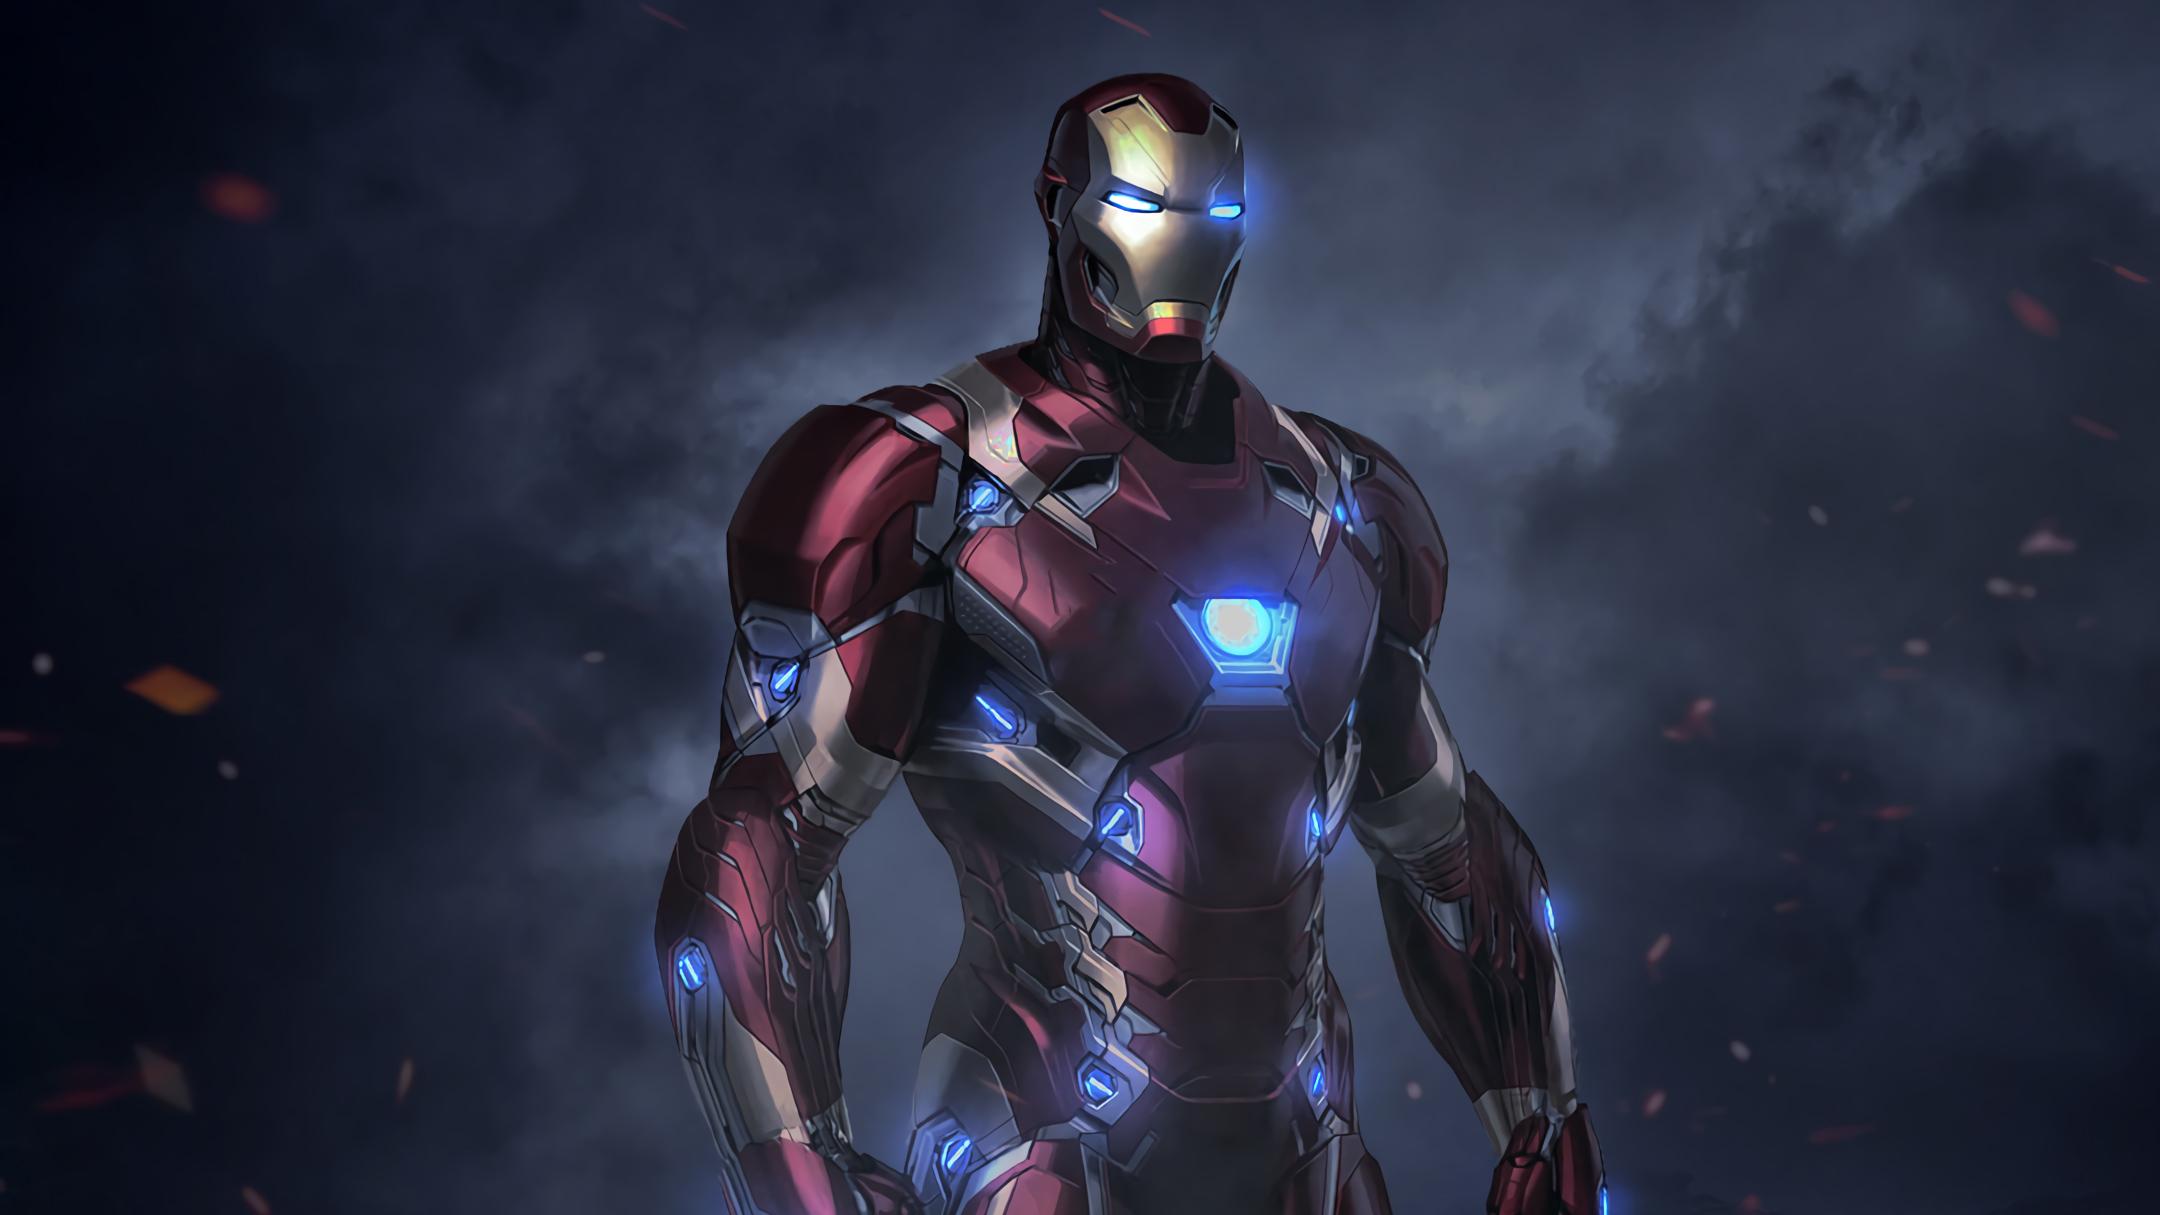 Iron Man Hd Wallpaper Background Image 2160x1215 Id